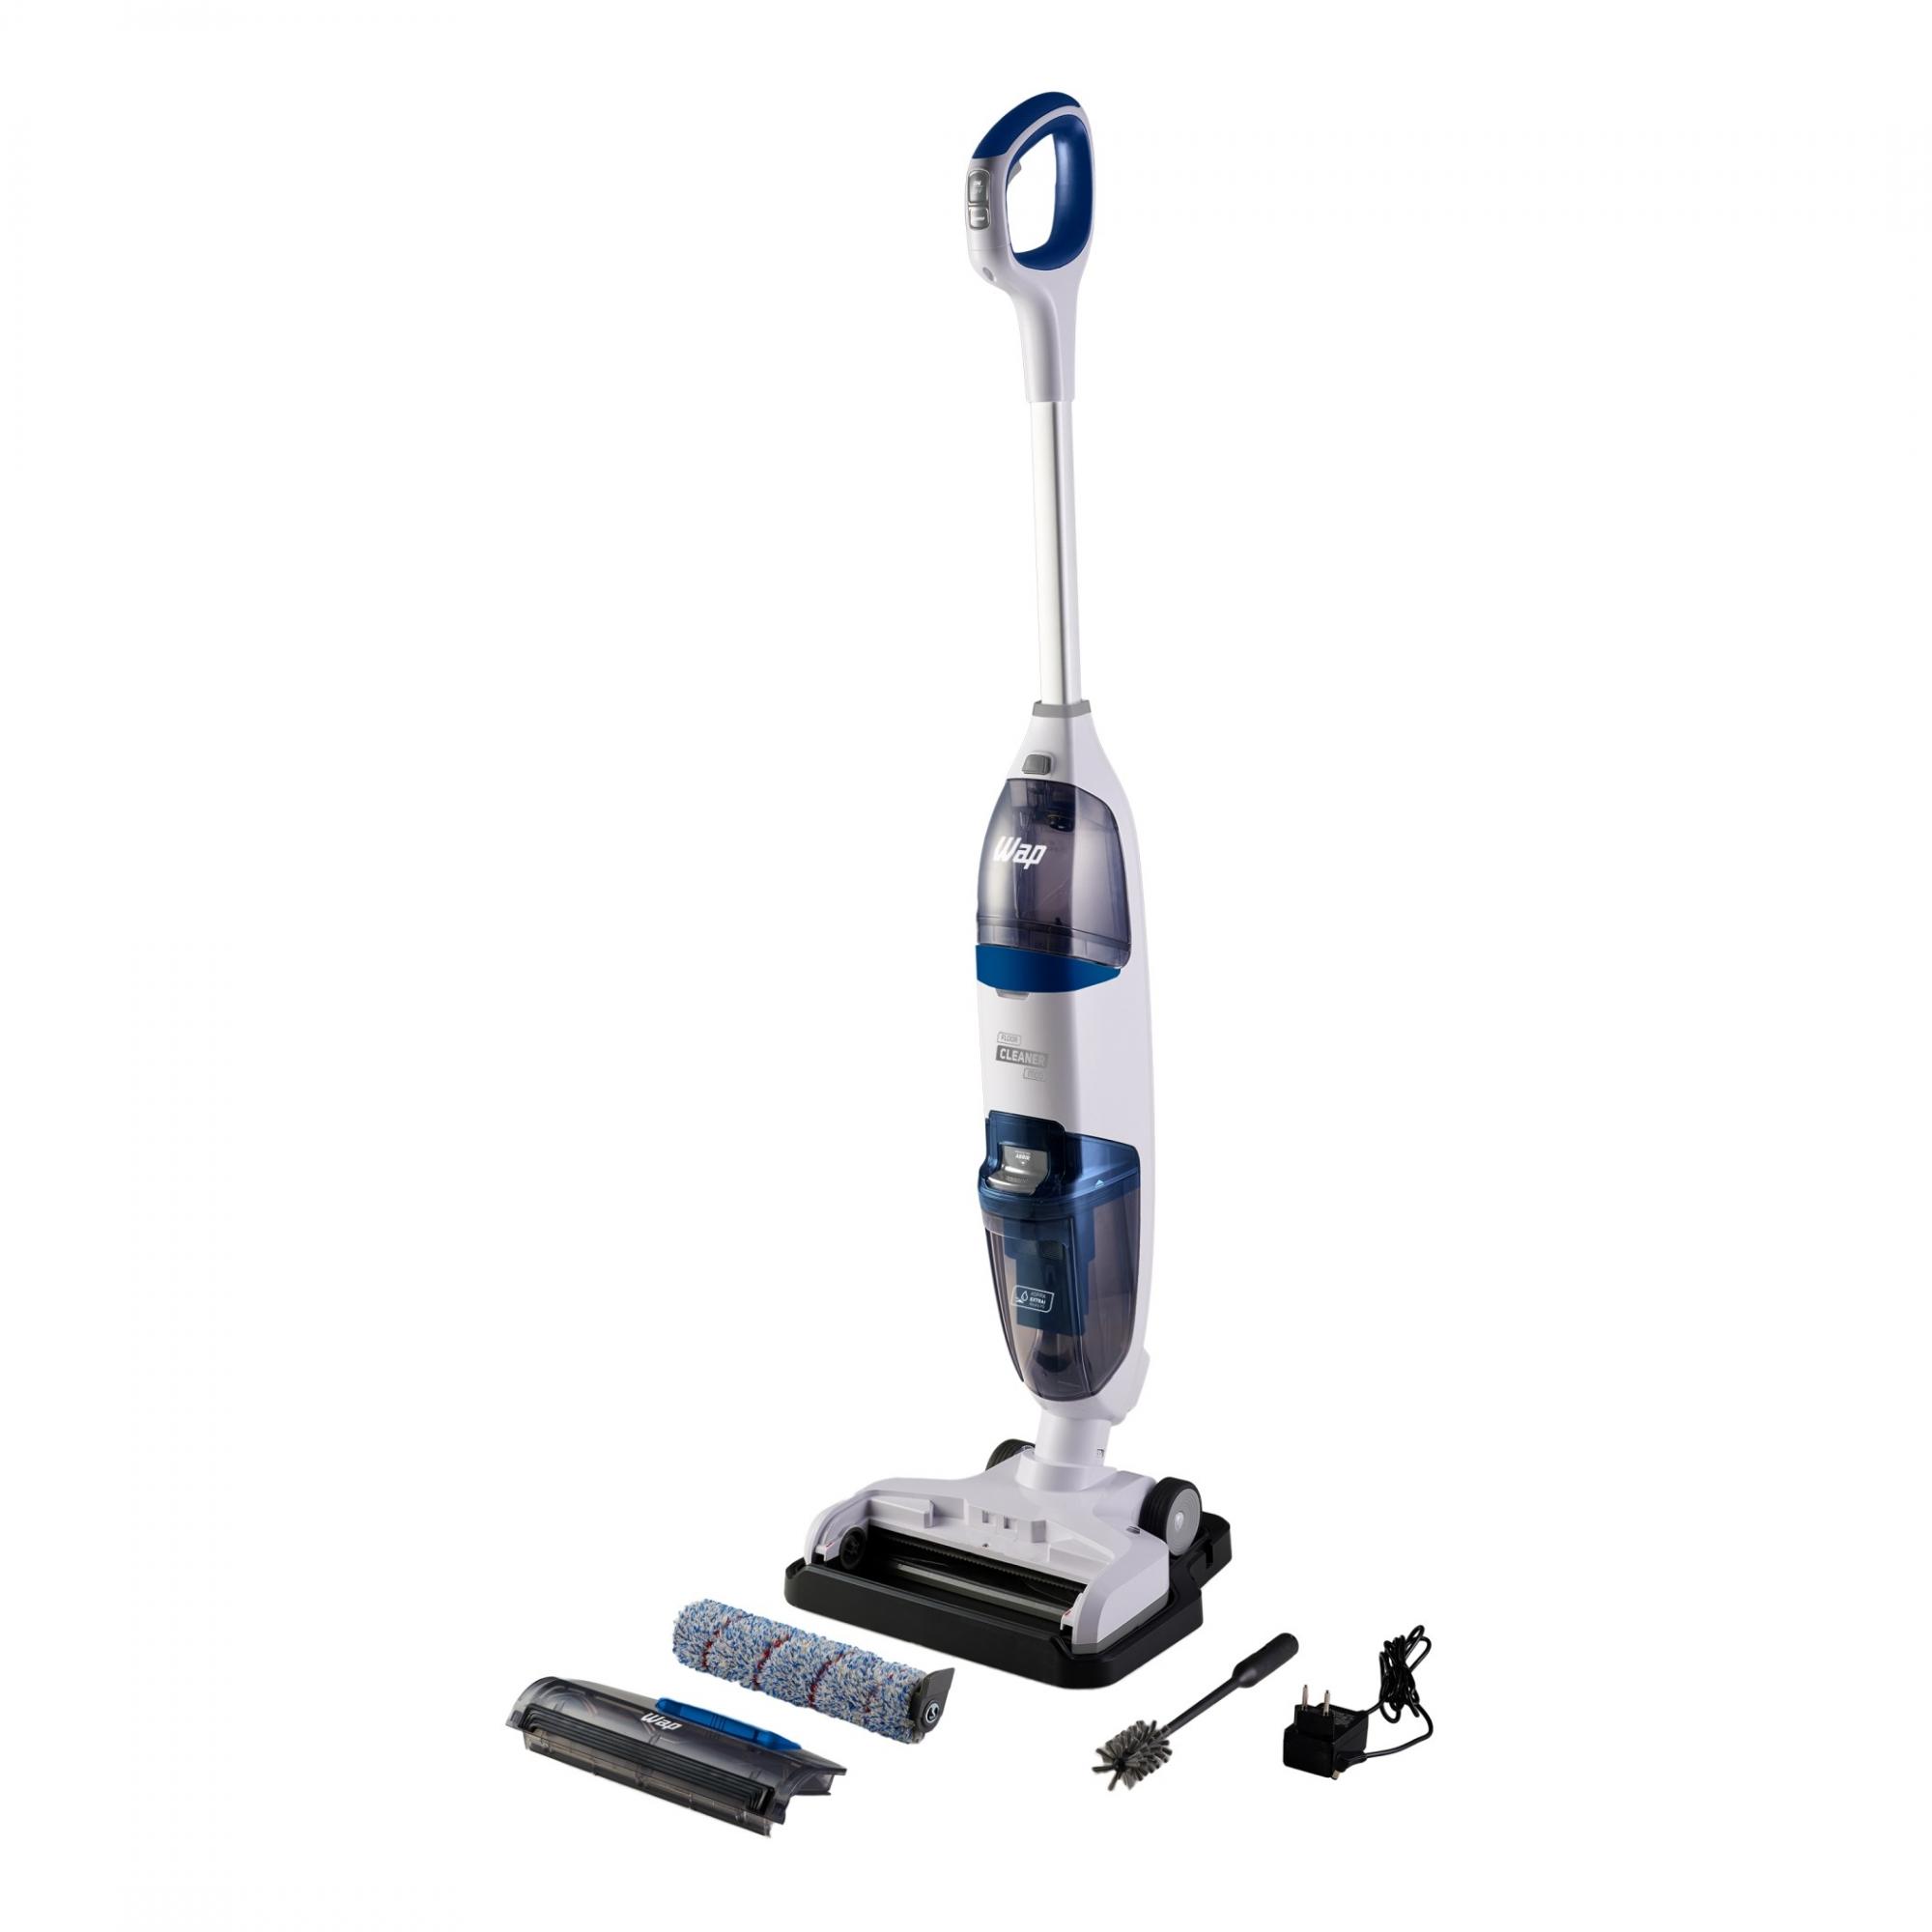 Extratora e Limpadora de Piso Vertical Floor Cleaner Mob - Wap